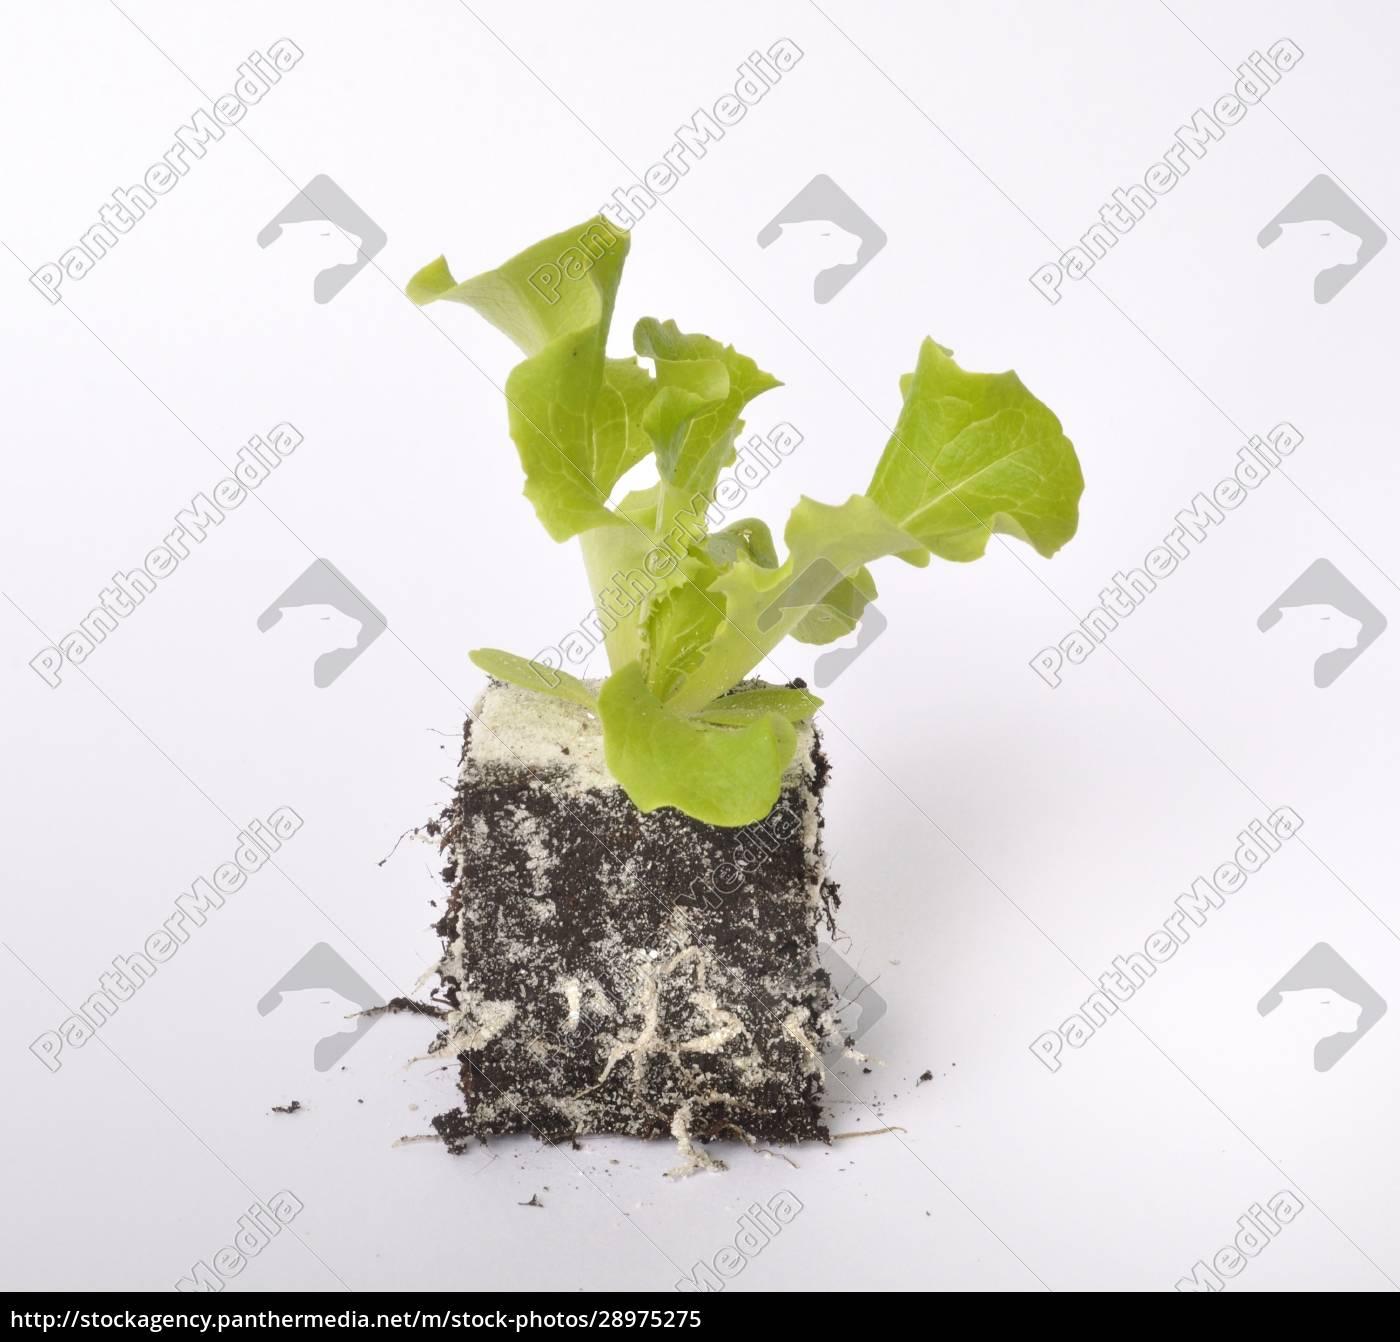 batavia, salatpflanzen - 28975275